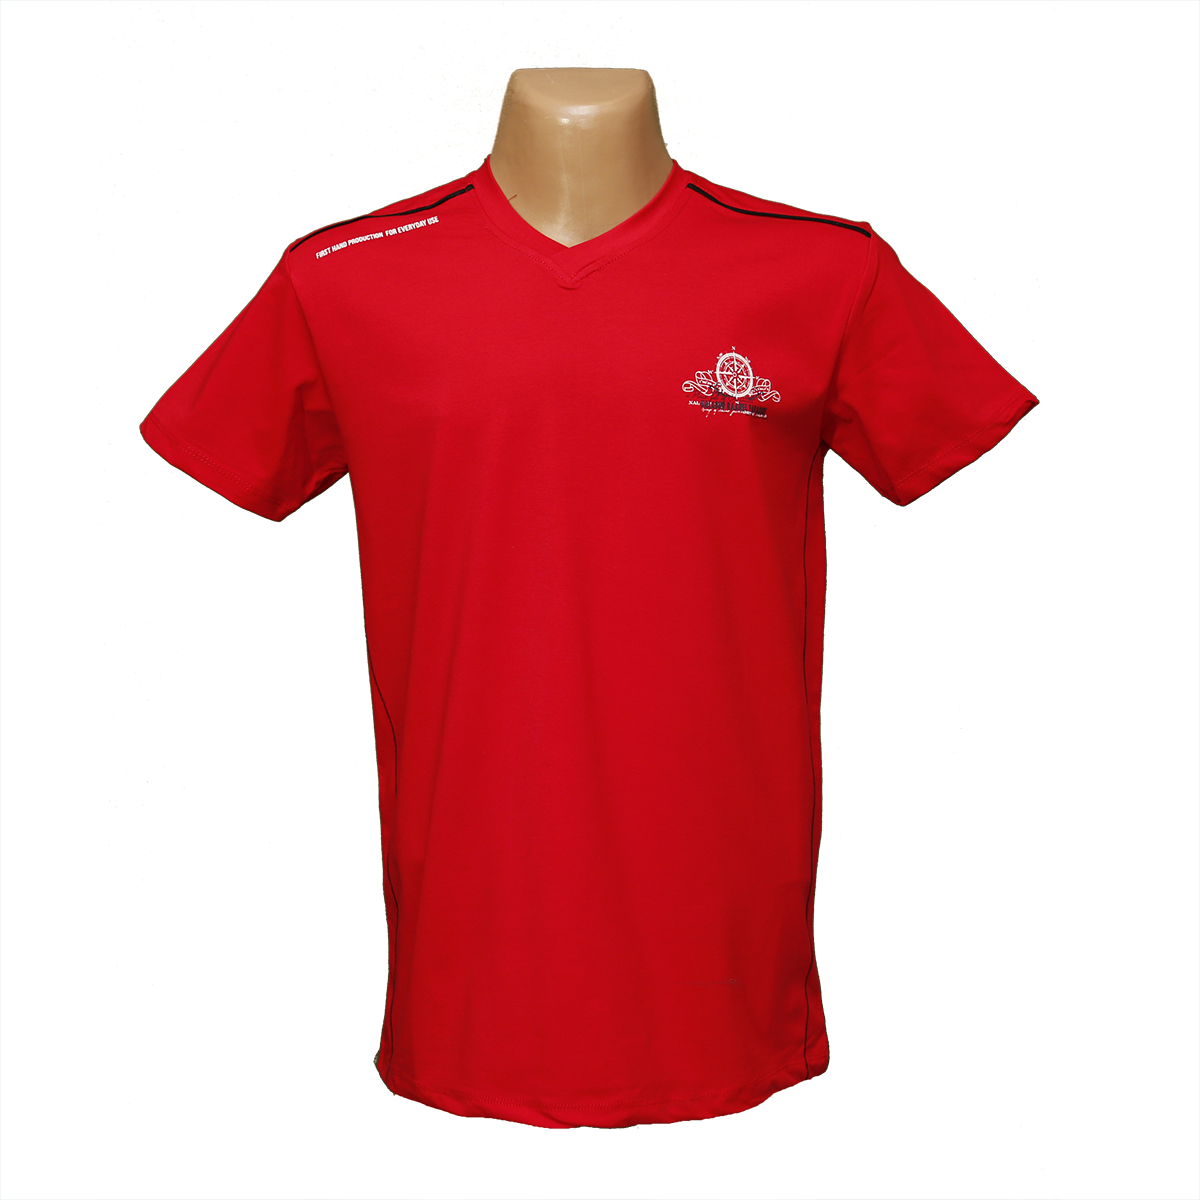 Мужская стрейчевая футболка Lycra тм. BY Walker. пр-во Турция 4016-7